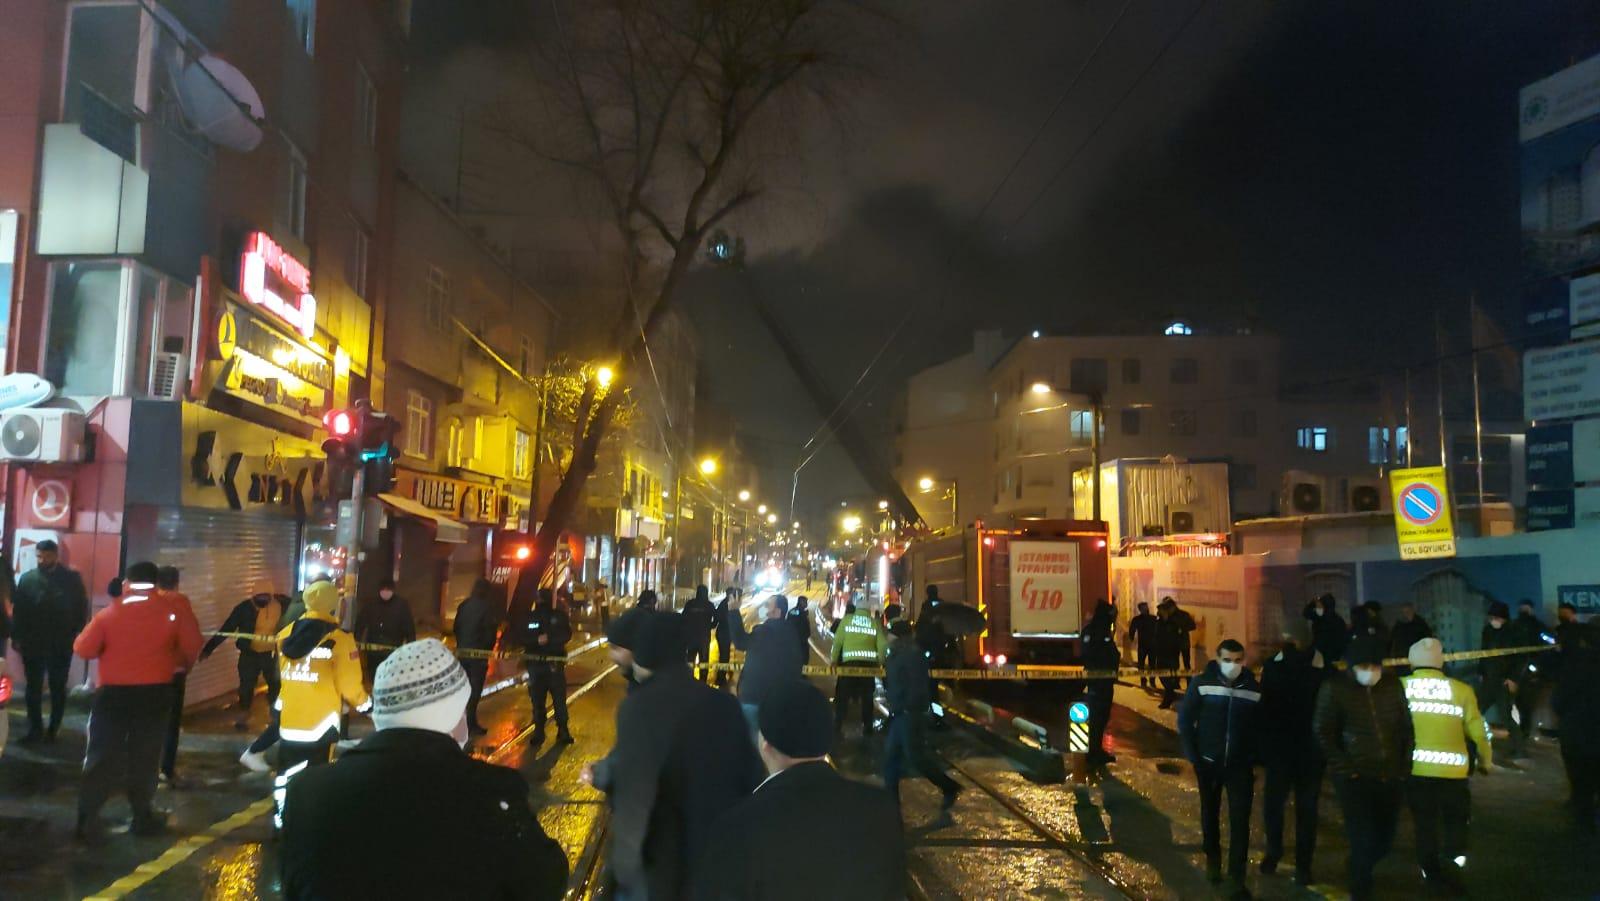 Zeytinburnu'nda çatı yangınında Can Pazarı yaşandı